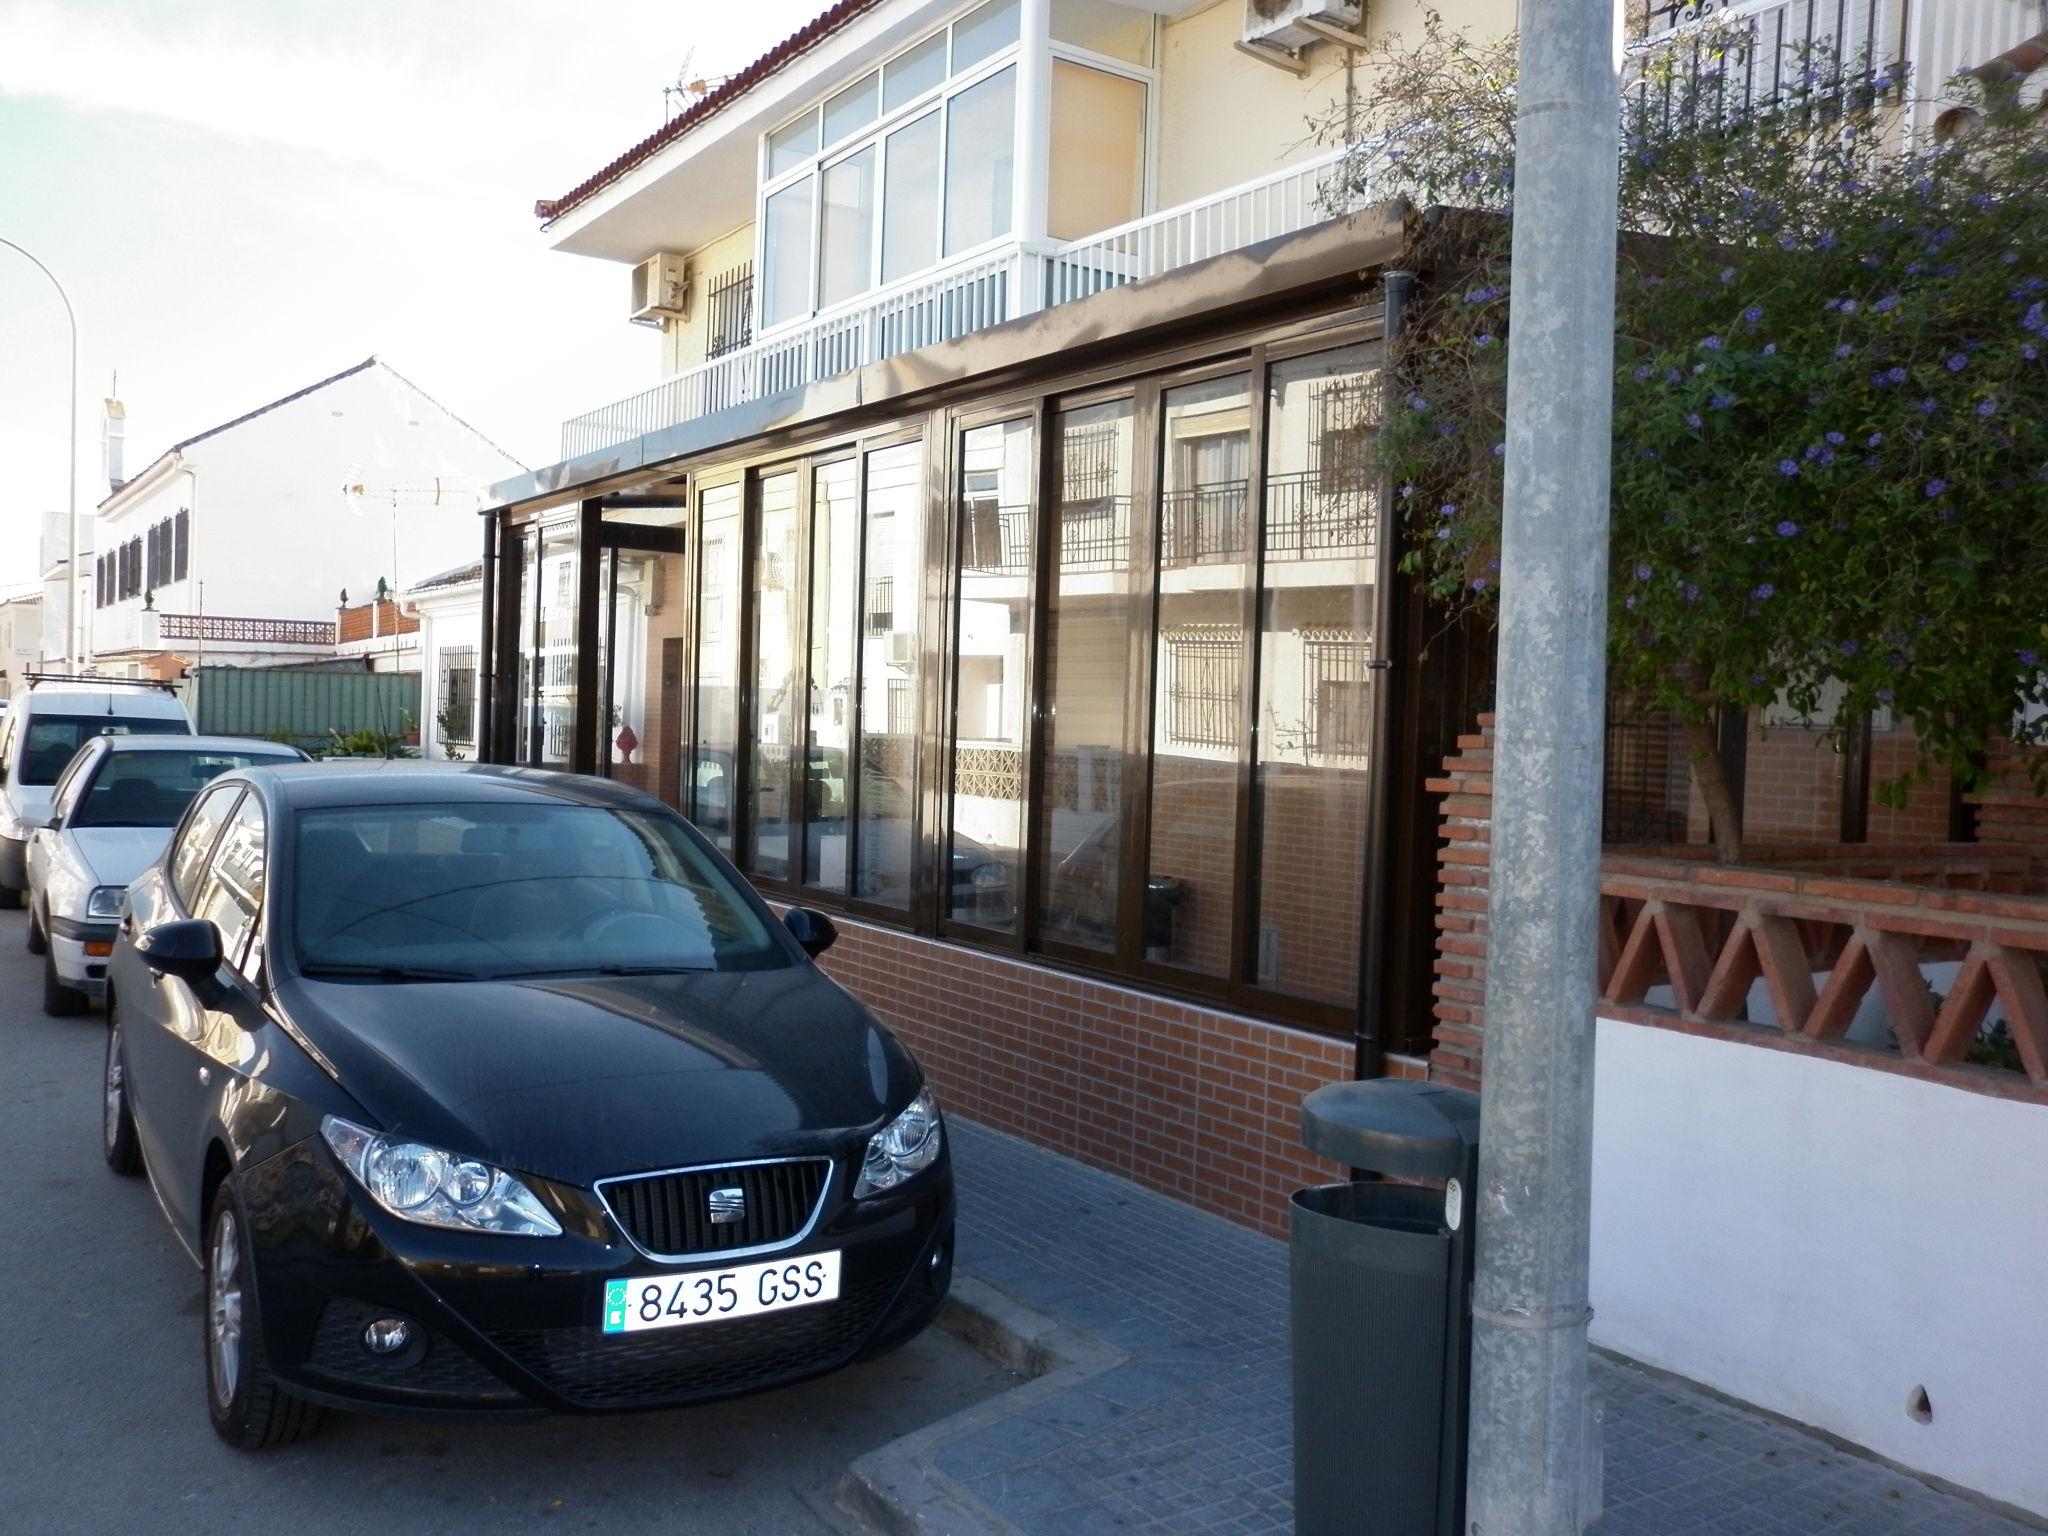 Foto 26 de Carpintería de aluminio, metálica y PVC en Málaga | Aluminios Alunoe